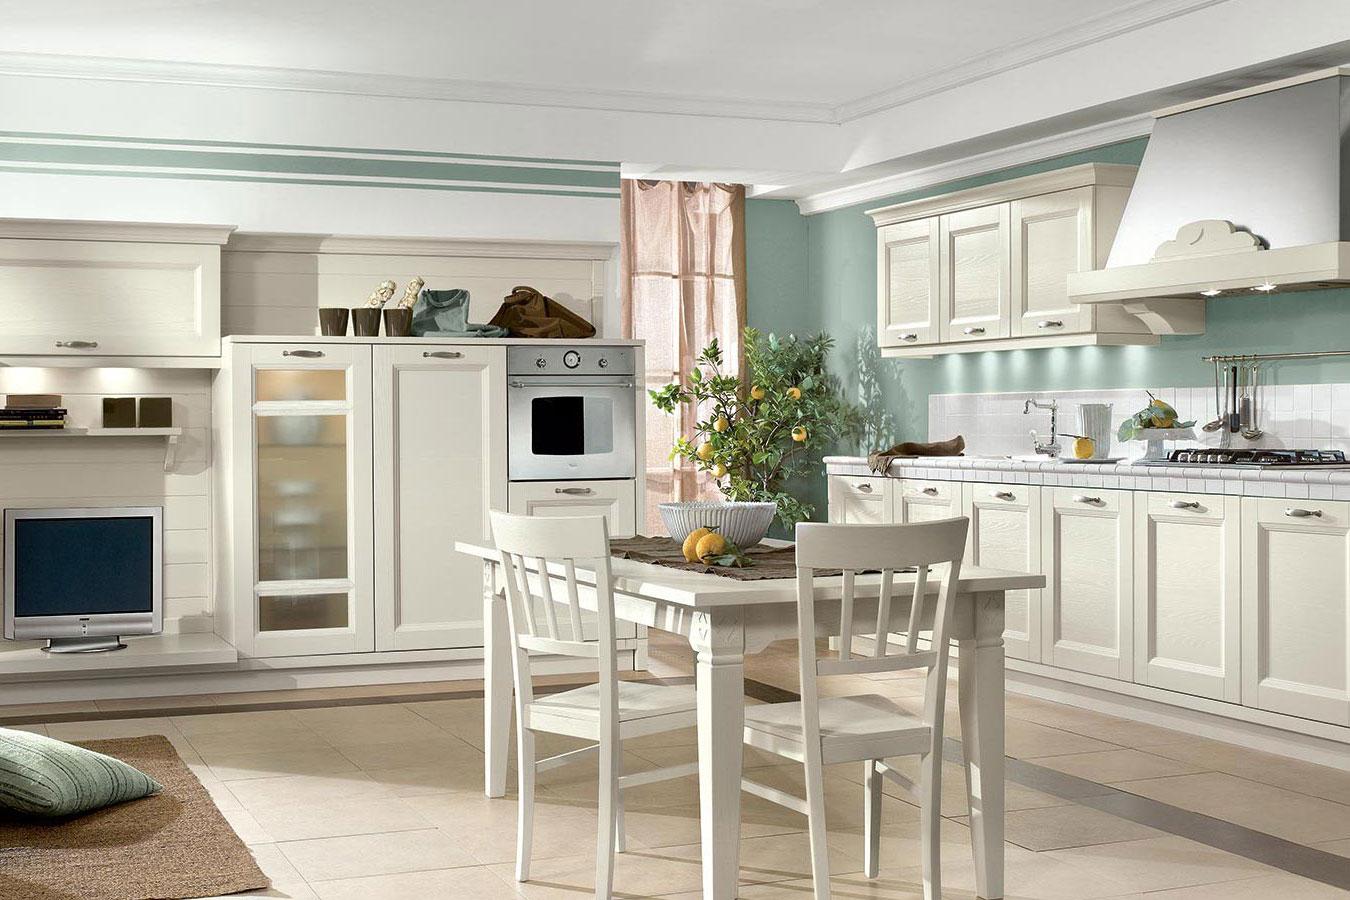 Arredo cucina classica stunning beautiful catalogo cucine - Idee arredo cucina classica ...